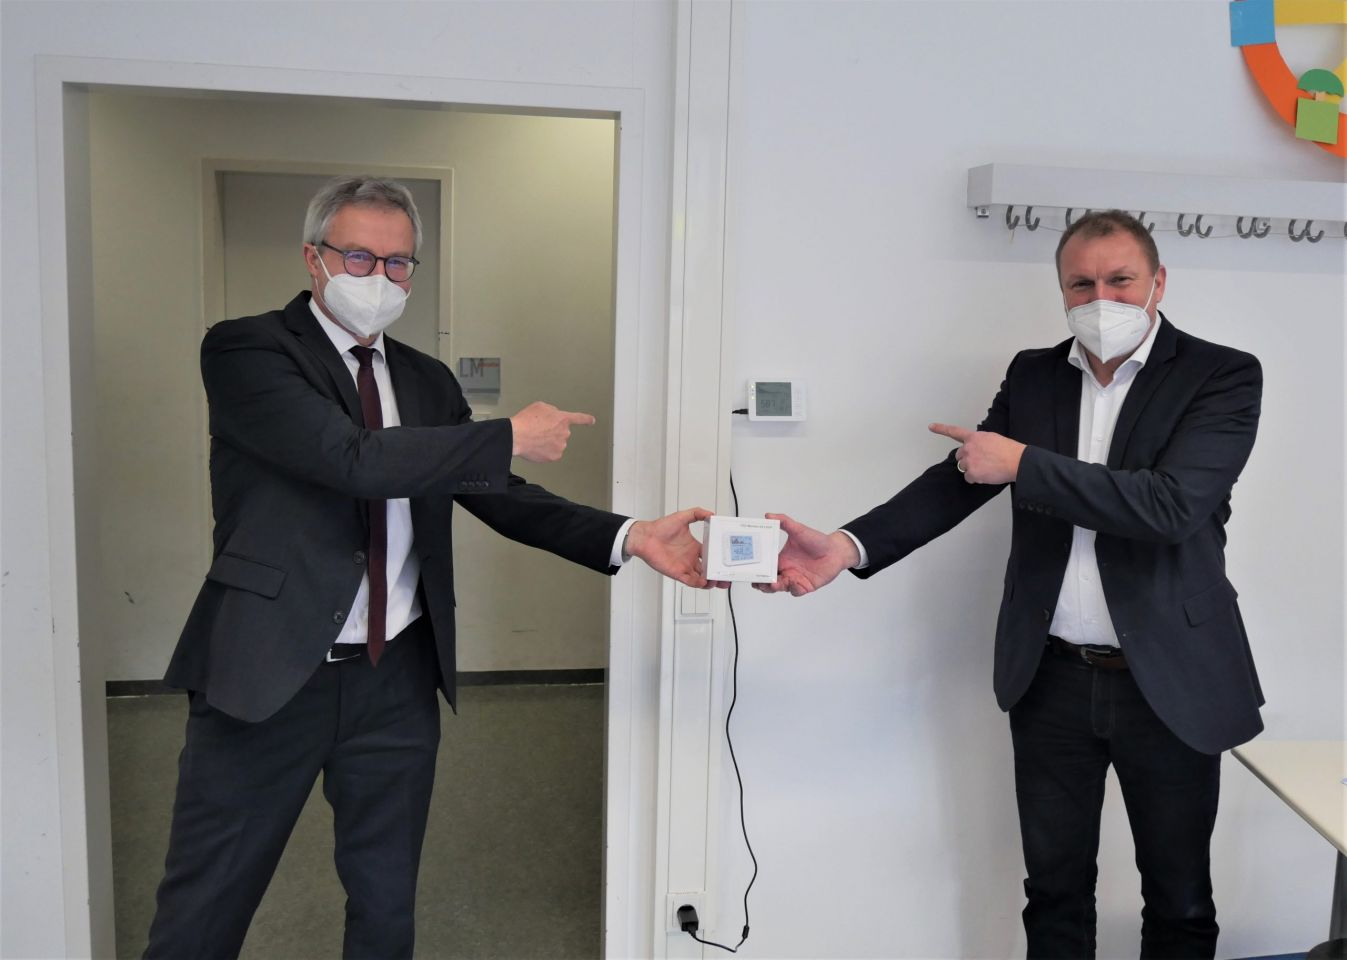 Landkreis nimmt CO2-Ampeln an Schulen in Betrieb